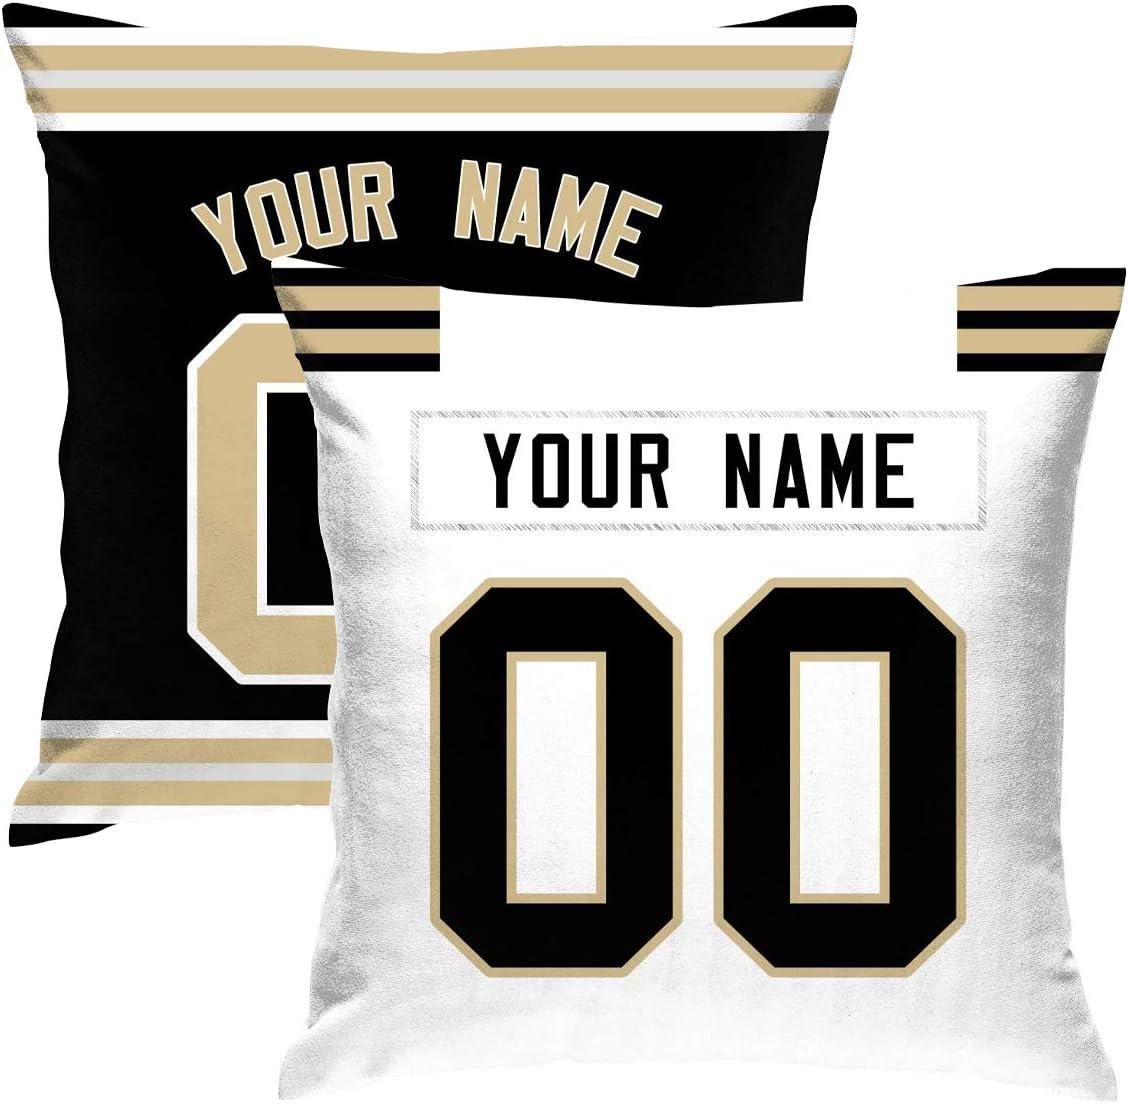 Buffalo Custom Decorative 2 Pack Throw Pillow 18 x 18 Print Personalized Football Style,Customization Design Any Name